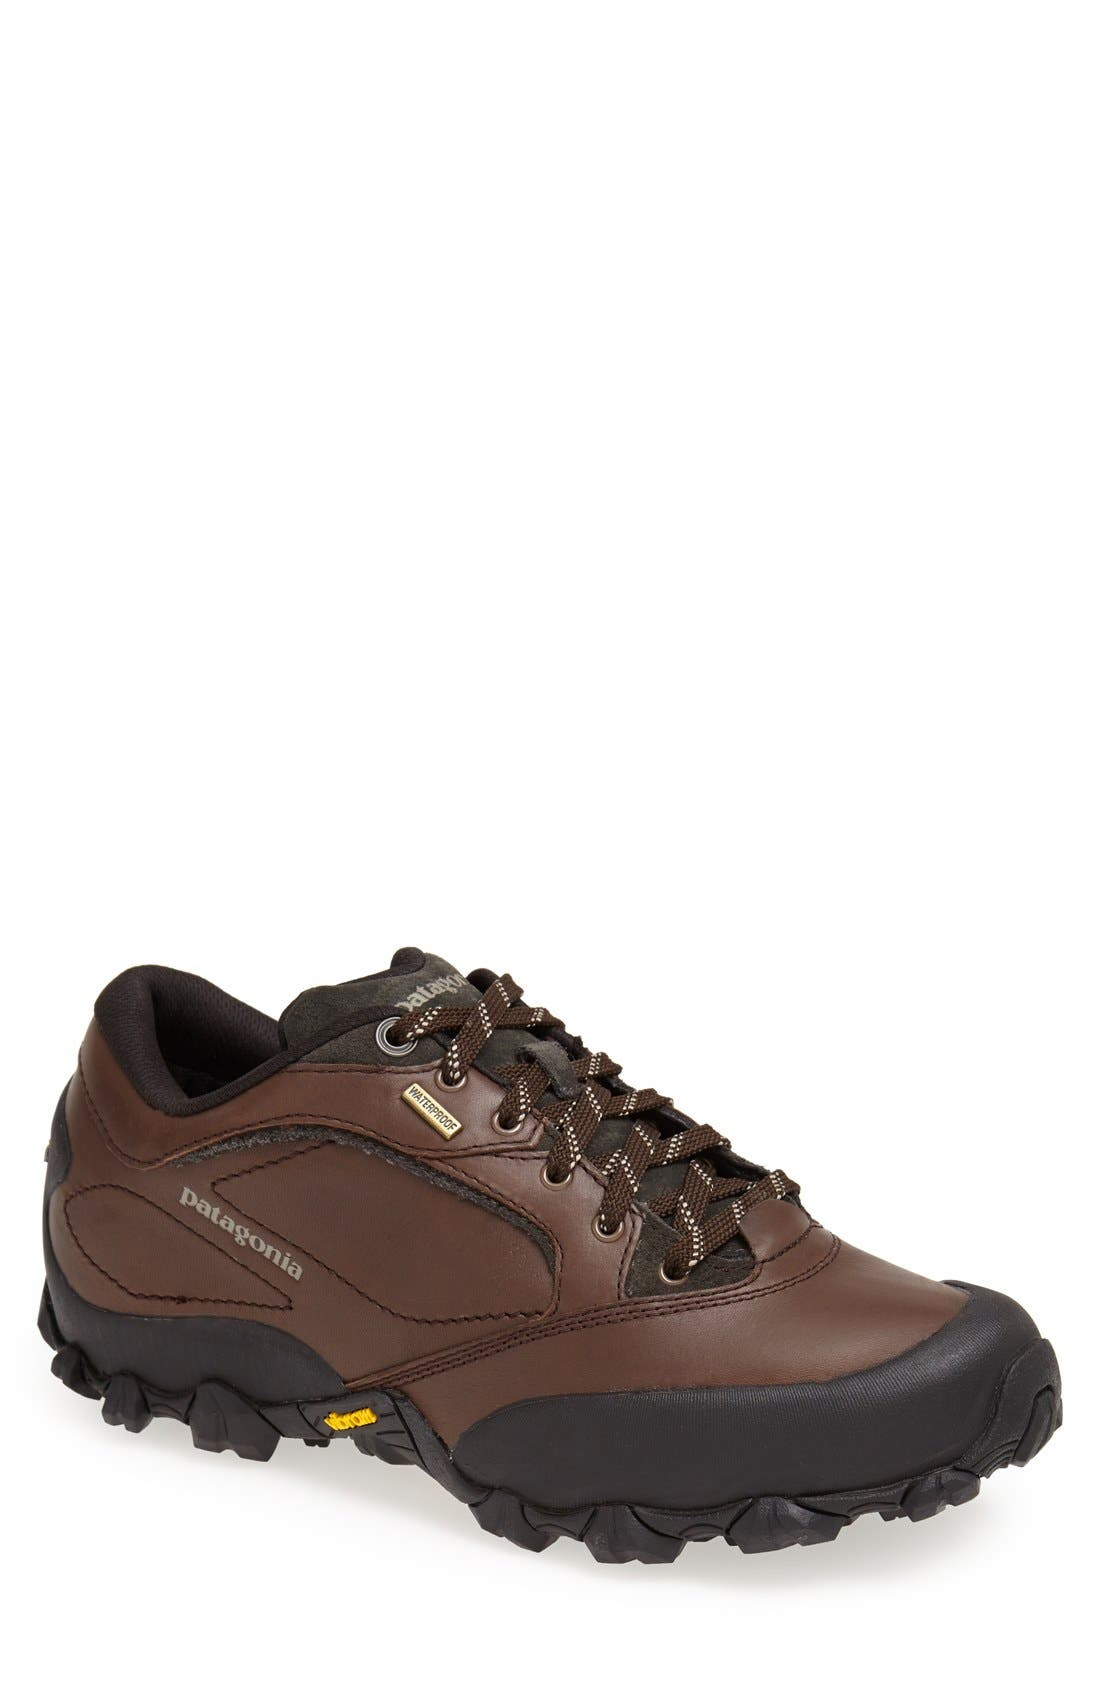 Main Image - Patagonia 'Drifter 2.0' Waterproof Hiking Shoe (Men)